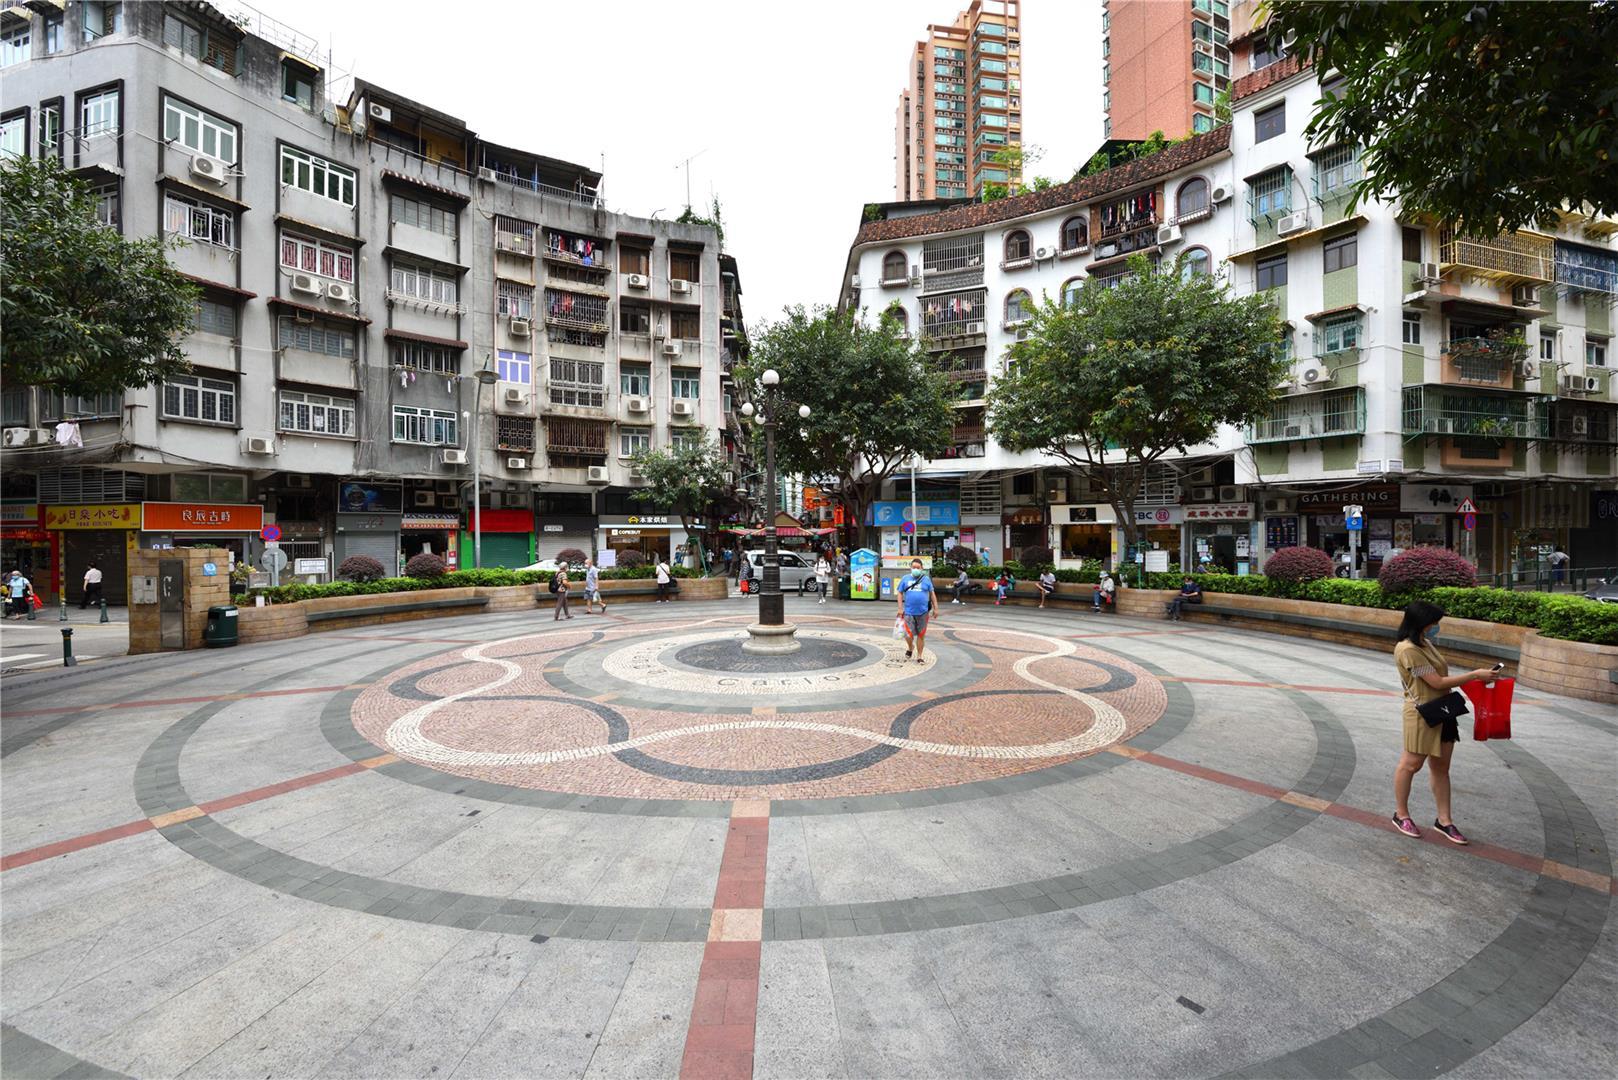 Rotunda de Carlos da Maia